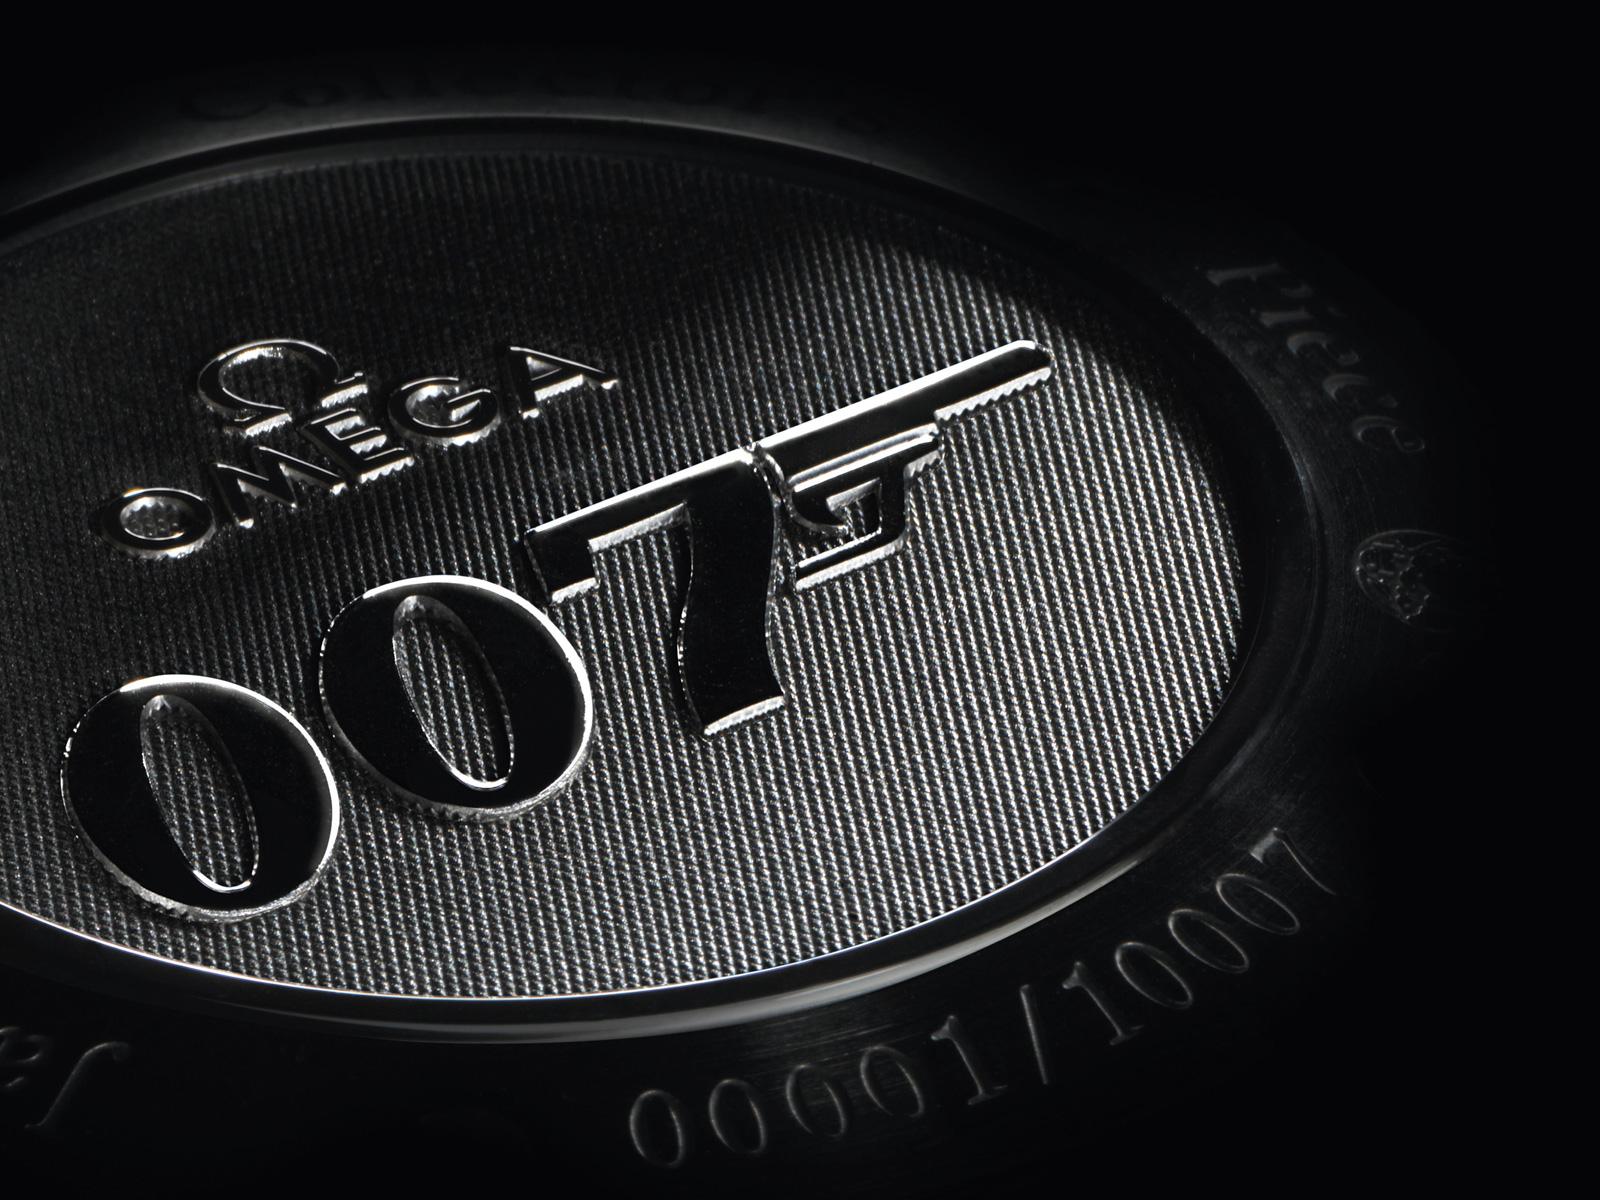 Desktop Wallpaper Omega Seamaster Watch 007 Logo Desktop